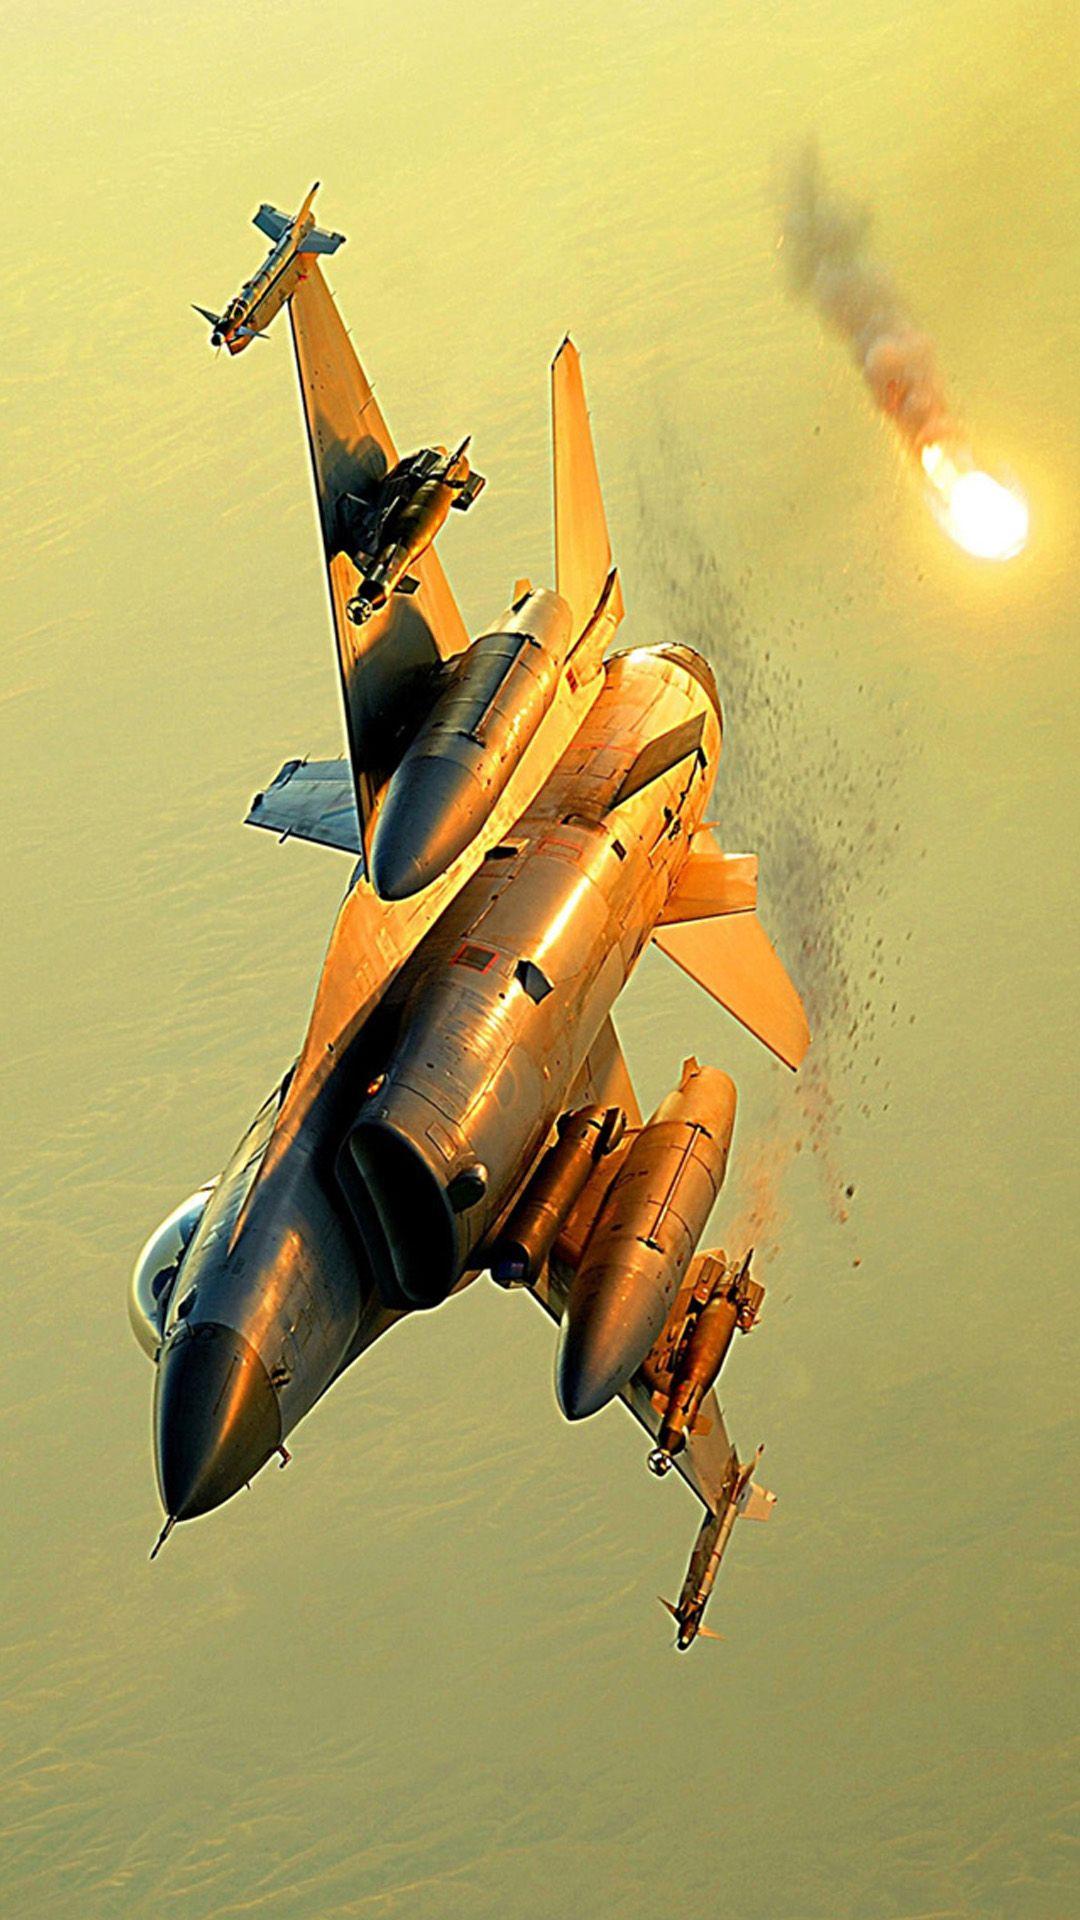 Belgian F16 deploys flares Fighter, Plane wallpaper